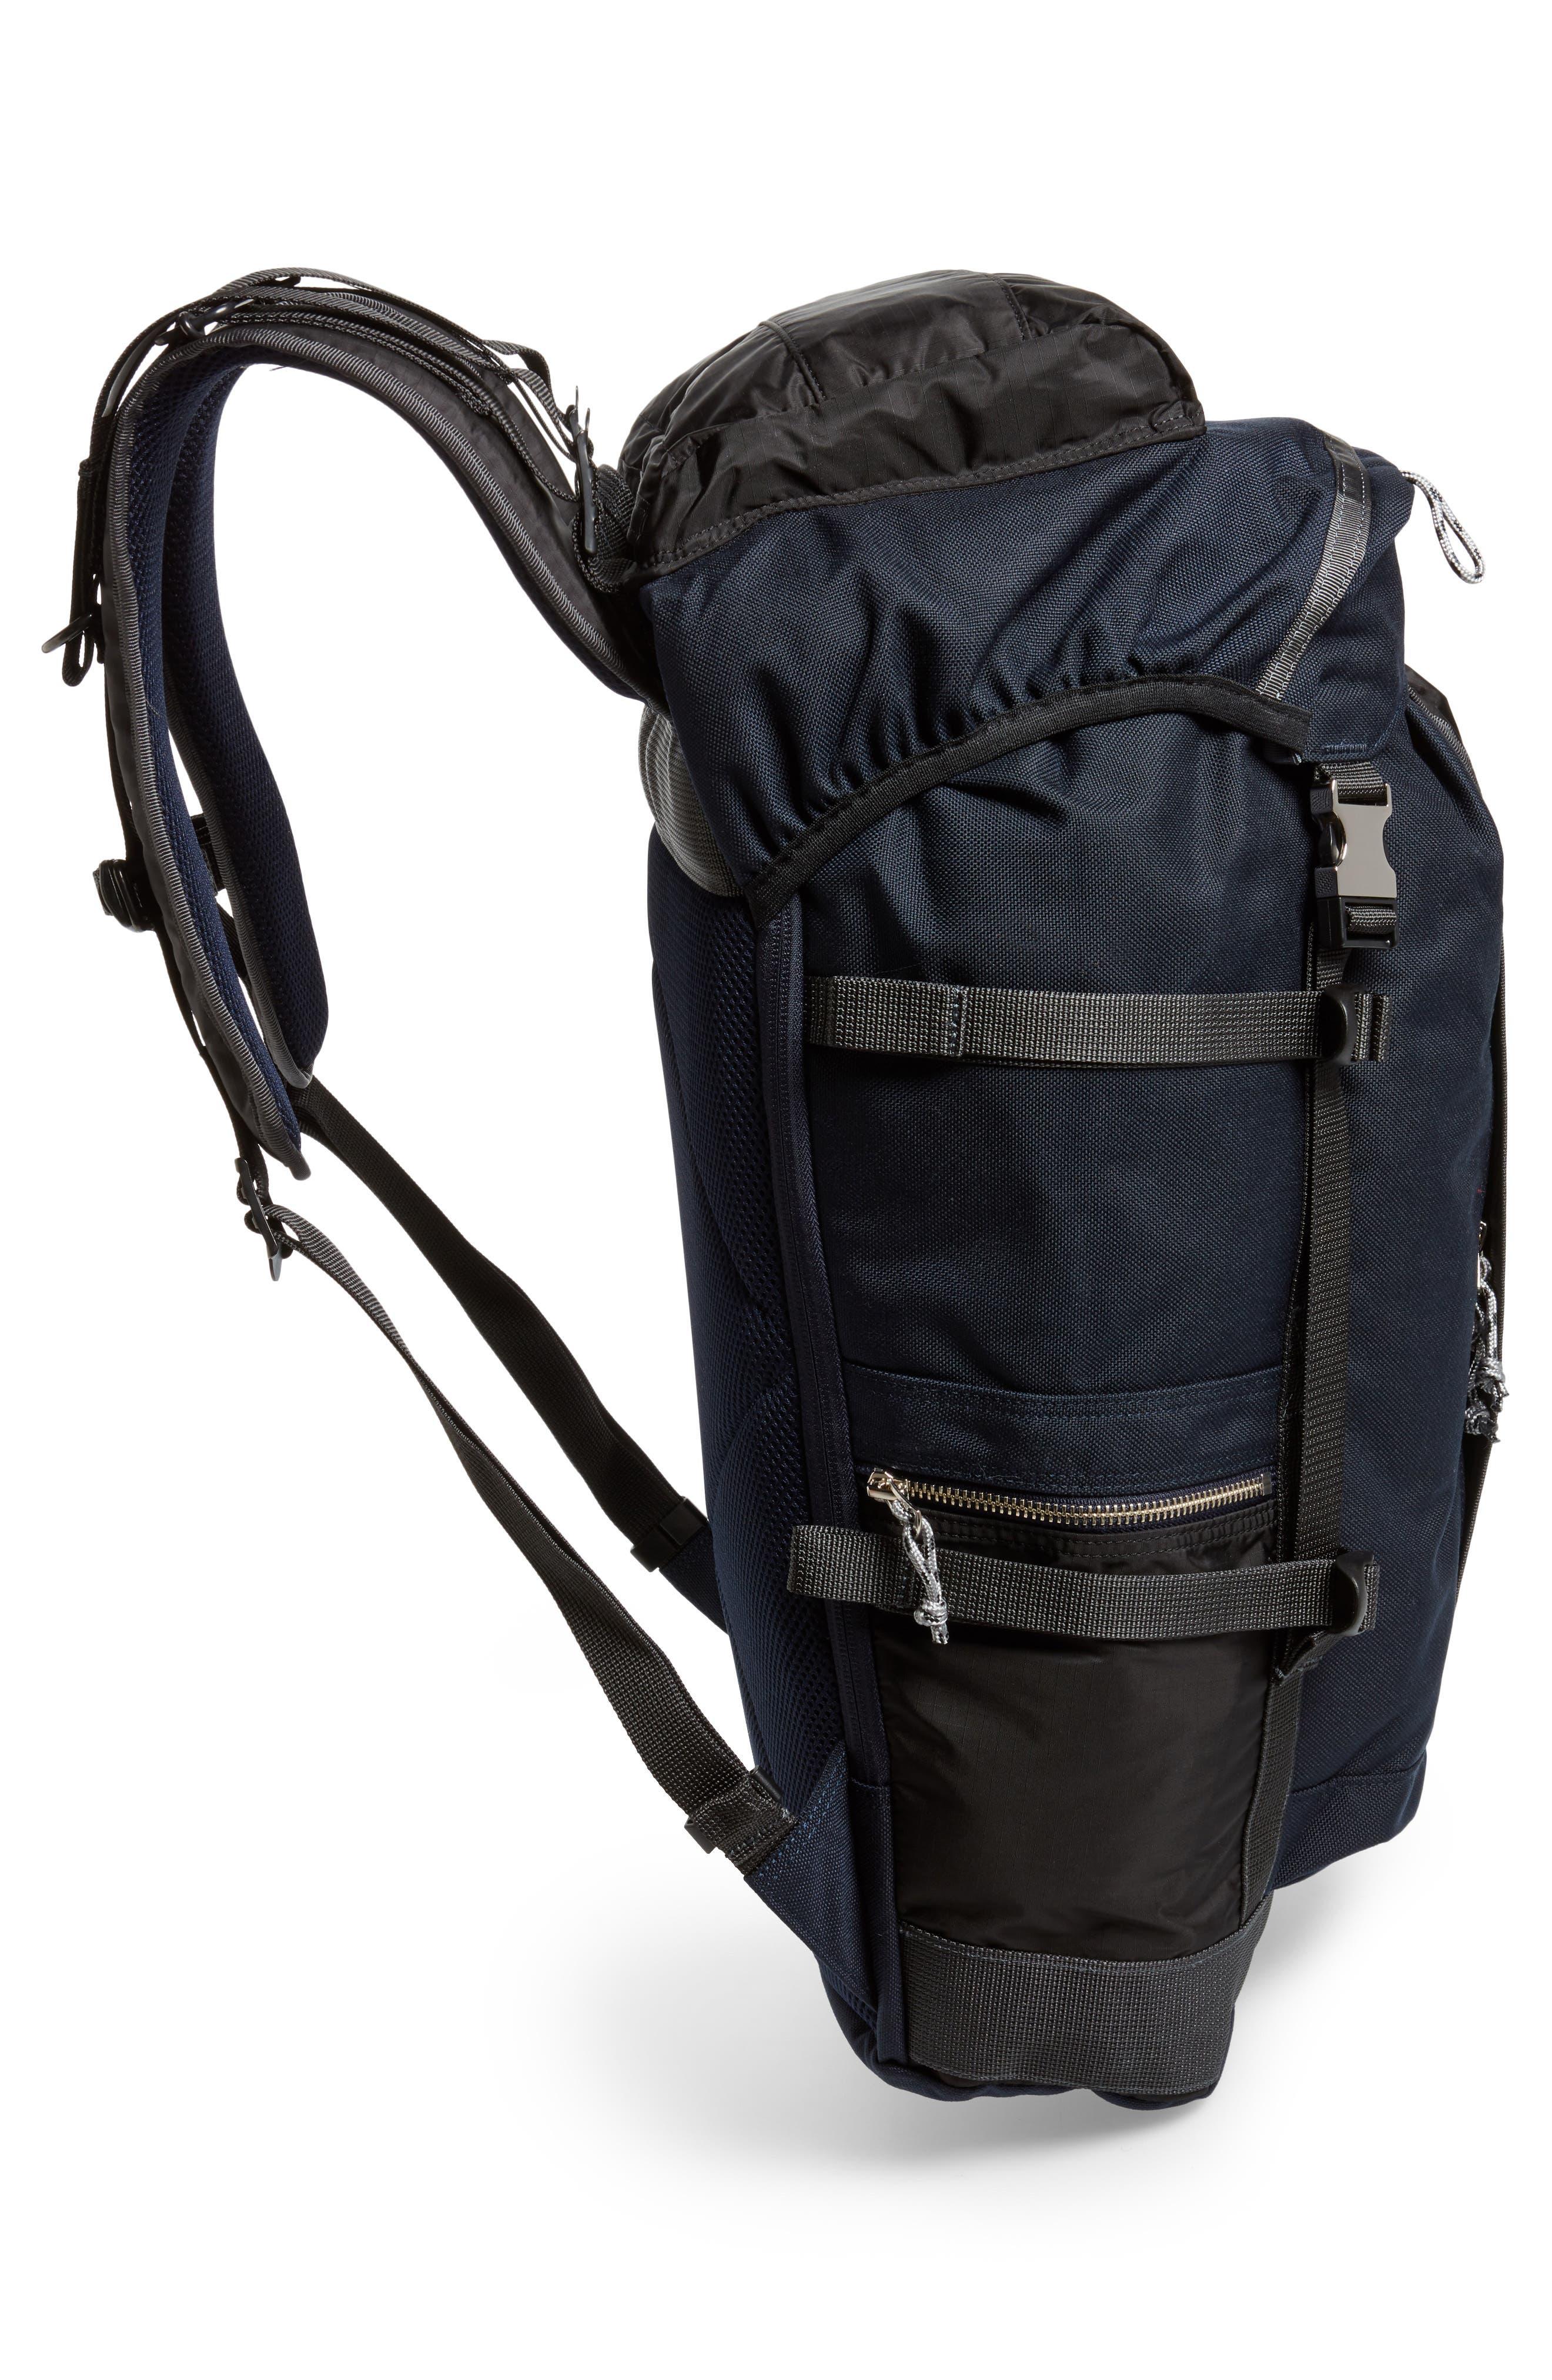 Porter-Yoshida & Co. Hype Backpack,                             Alternate thumbnail 5, color,                             Navy/ Black